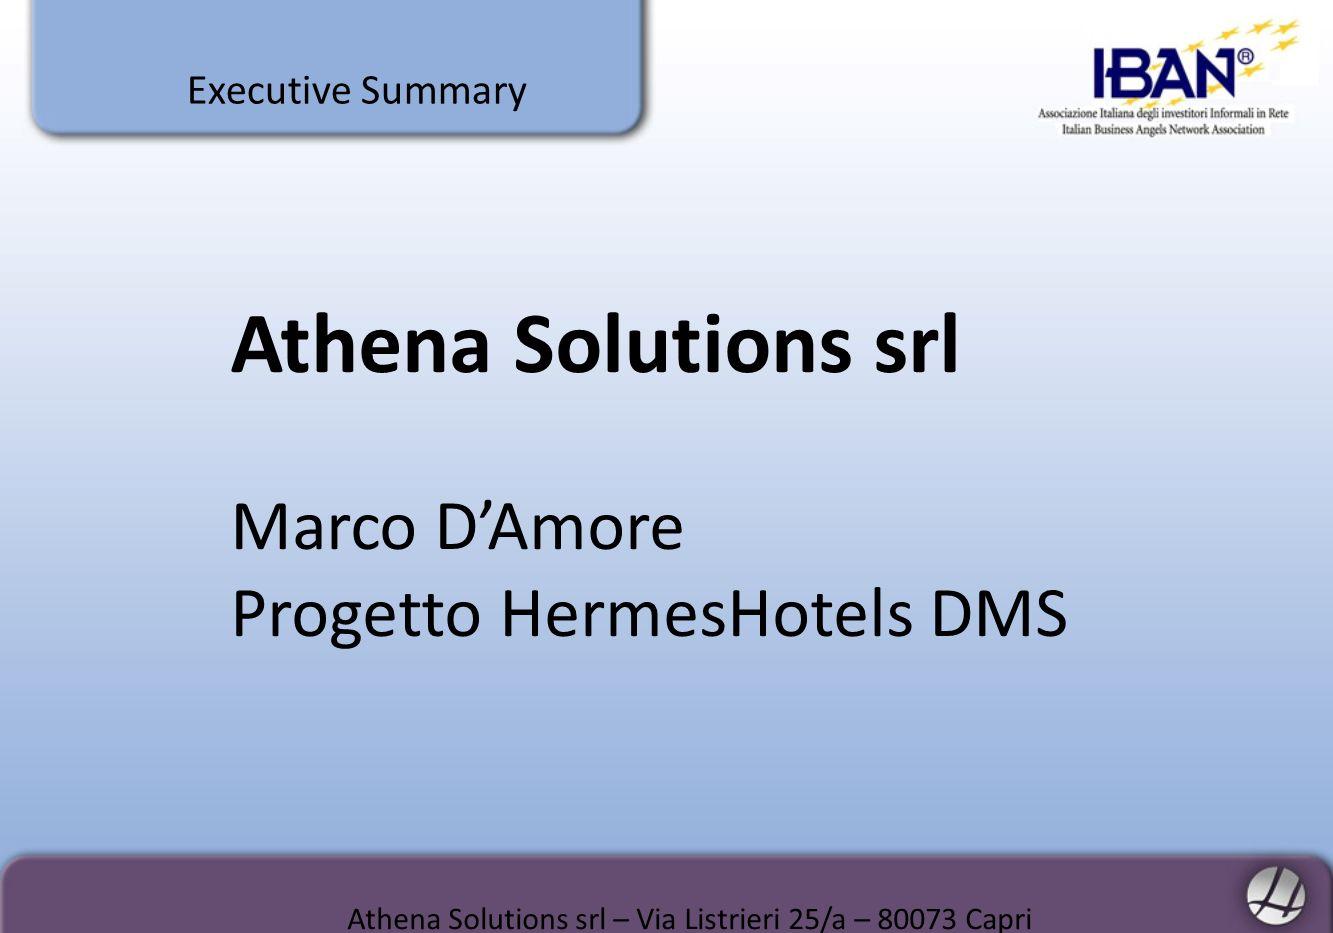 Executive Summary Athena Solutions srl Marco DAmore Progetto HermesHotels DMS Athena Solutions srl – Via Listrieri 25/a – 80073 Capri